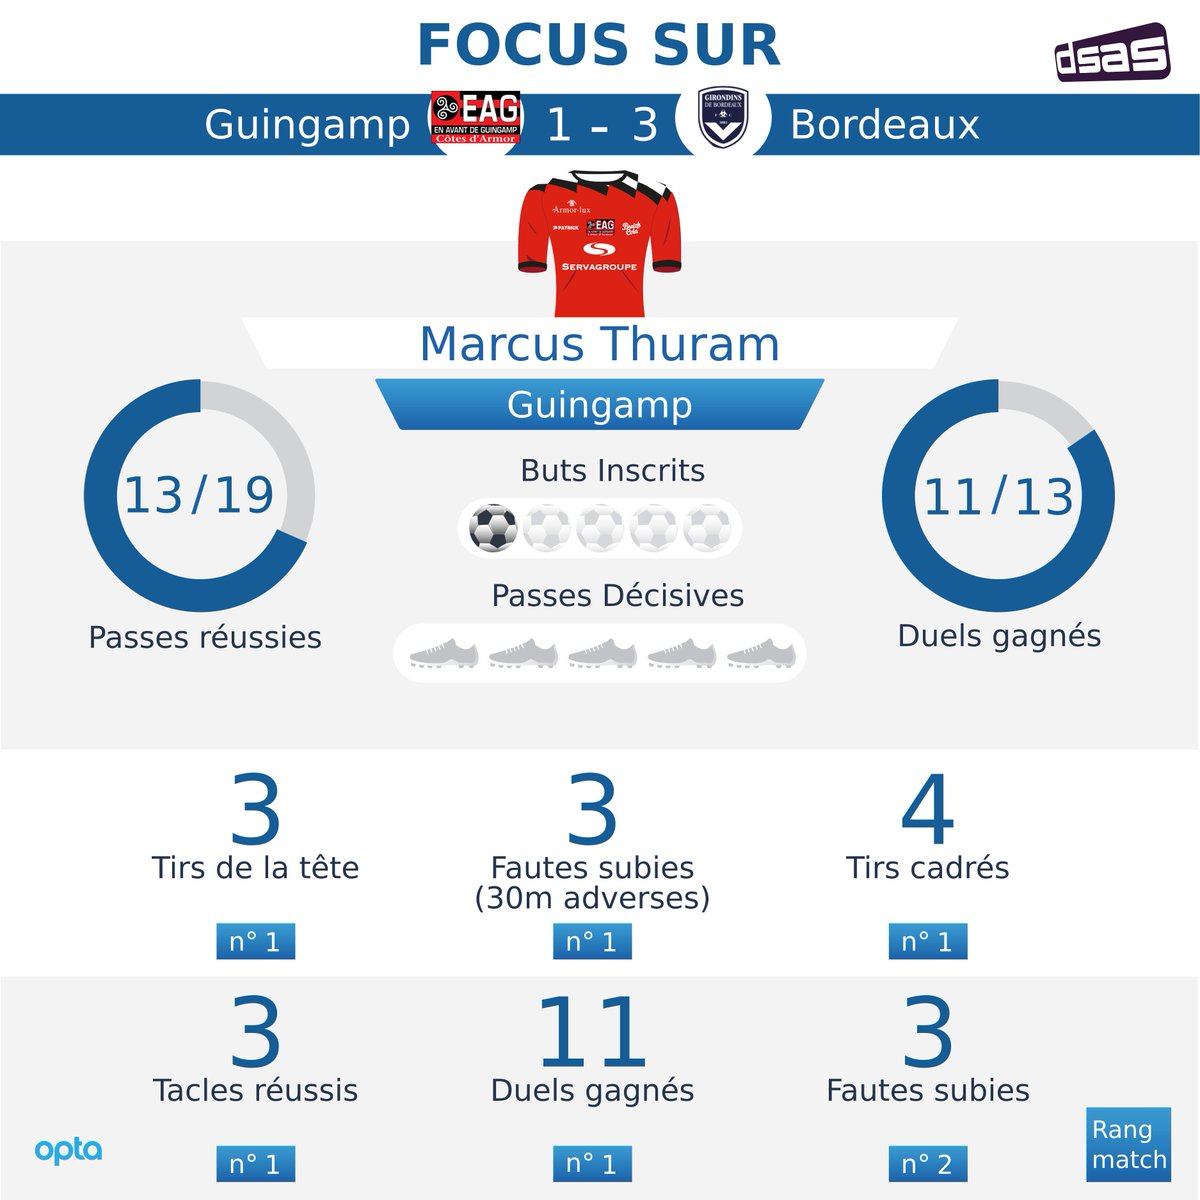 [#Ligue1]    #EAGFCGB#Guingamp 1-3 #BordeauxGros plan sur le match de @MarcusThuram   #Thuram #EAG  - FestivalFocus